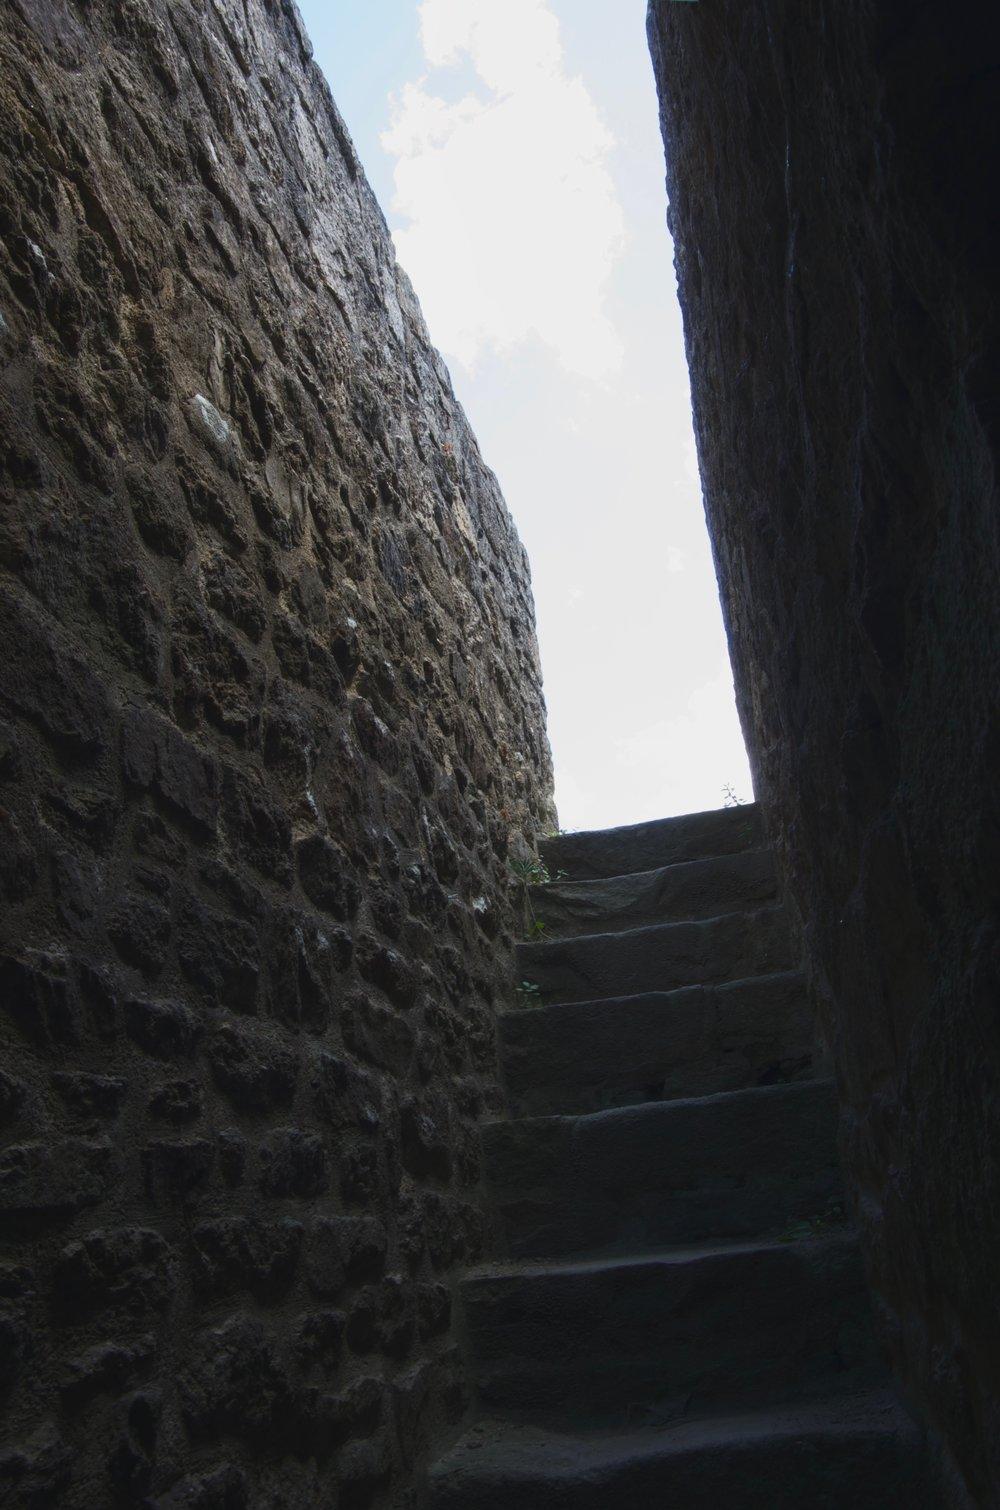 Escalier du mur d'enceinte, Dinan